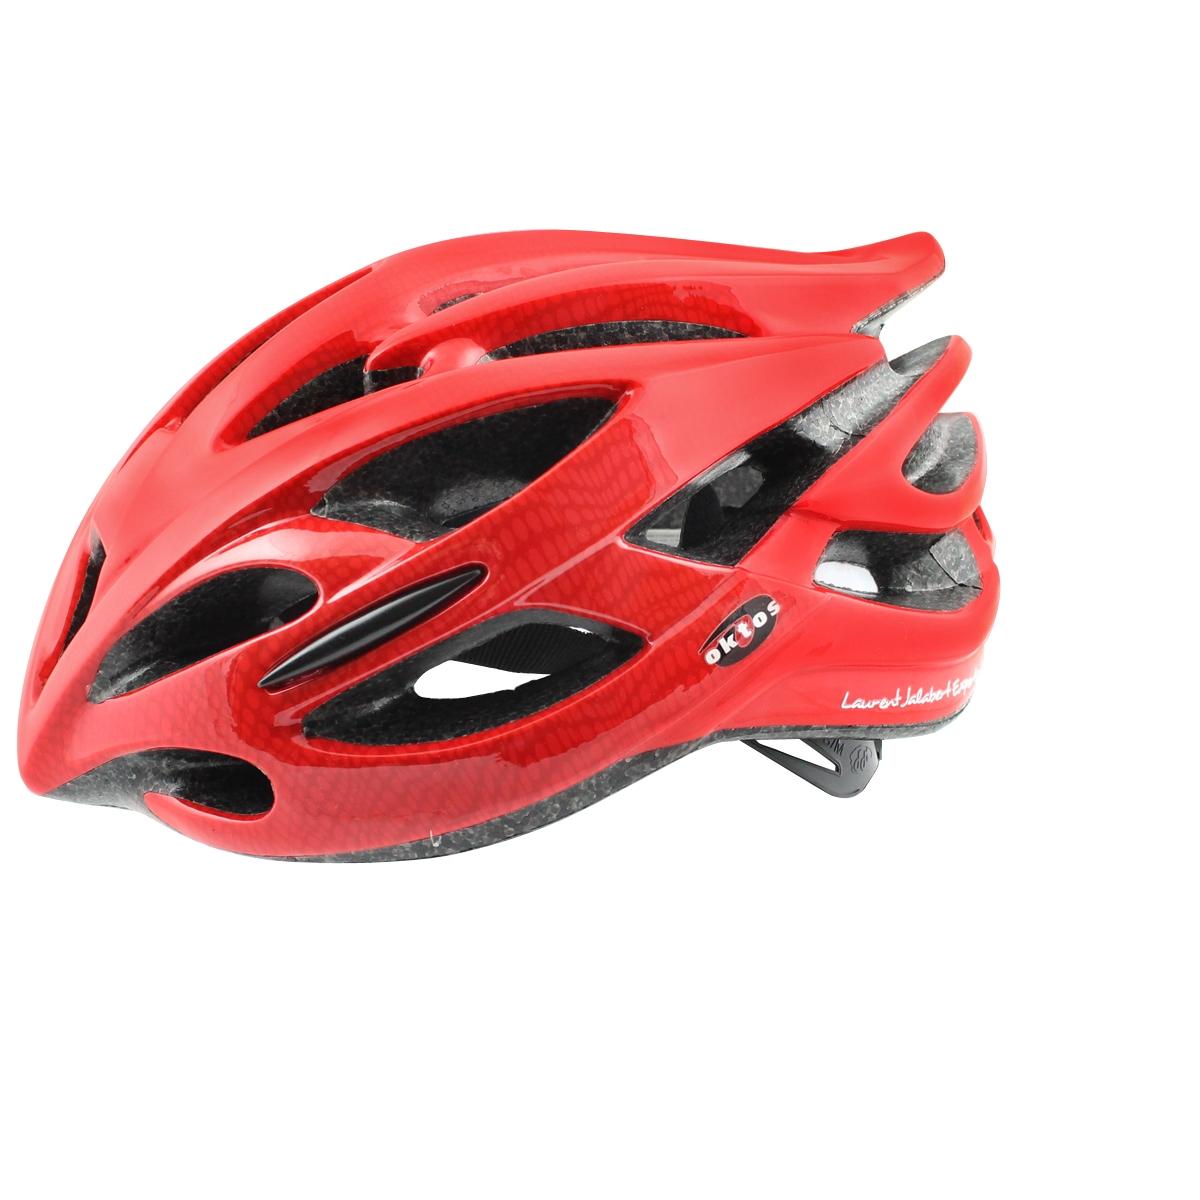 Casque vélo Oktos Racing Jalabert Rouge - S/M 52-58 cm